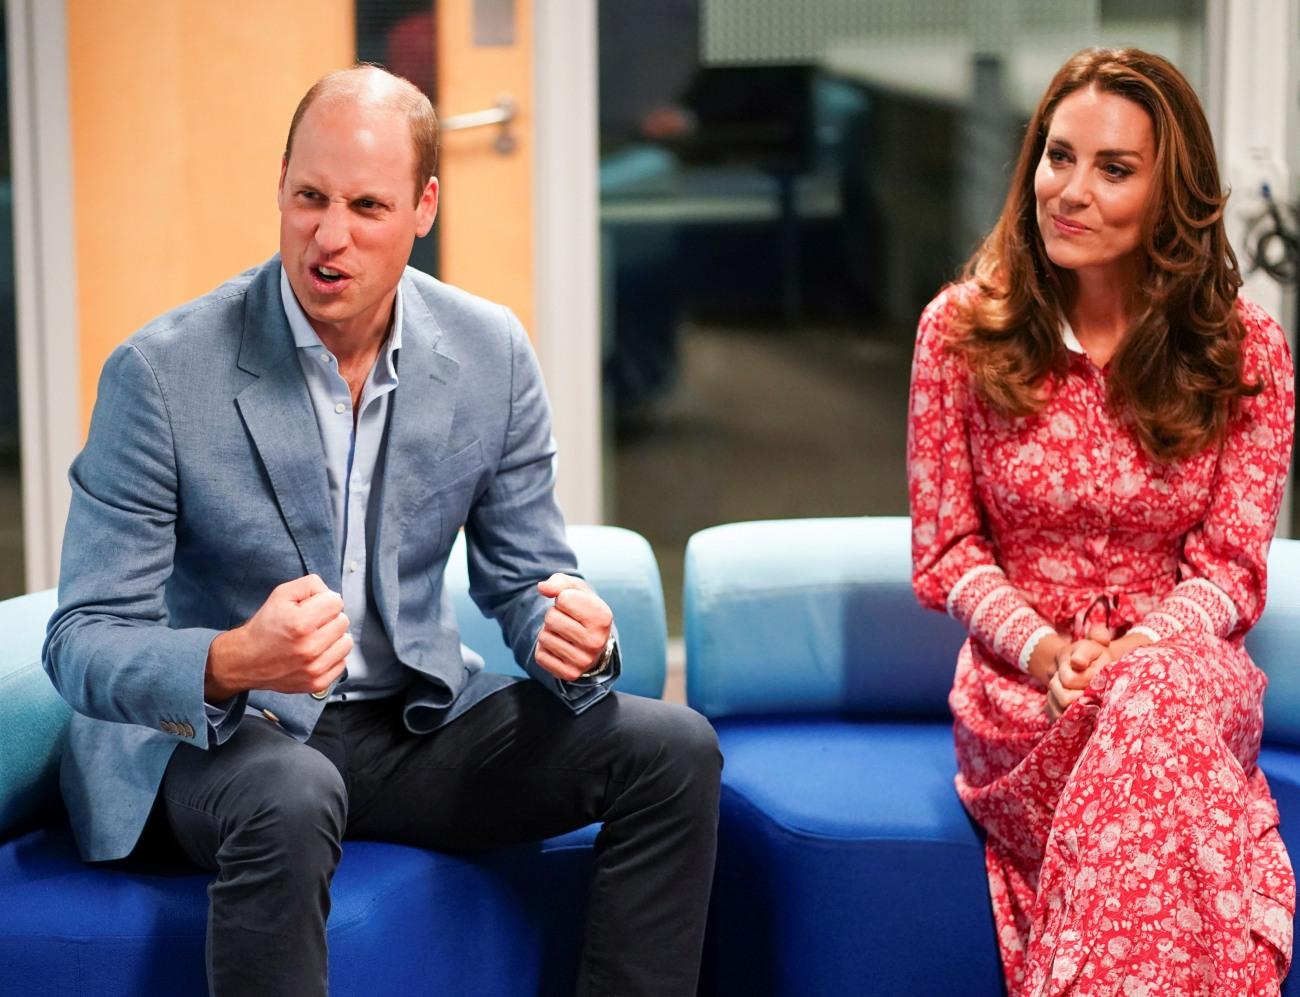 Prince William and Catherine, Duchess of Cambridge, of Great Britain, speak to employers at London Bridge Jobcentre, London